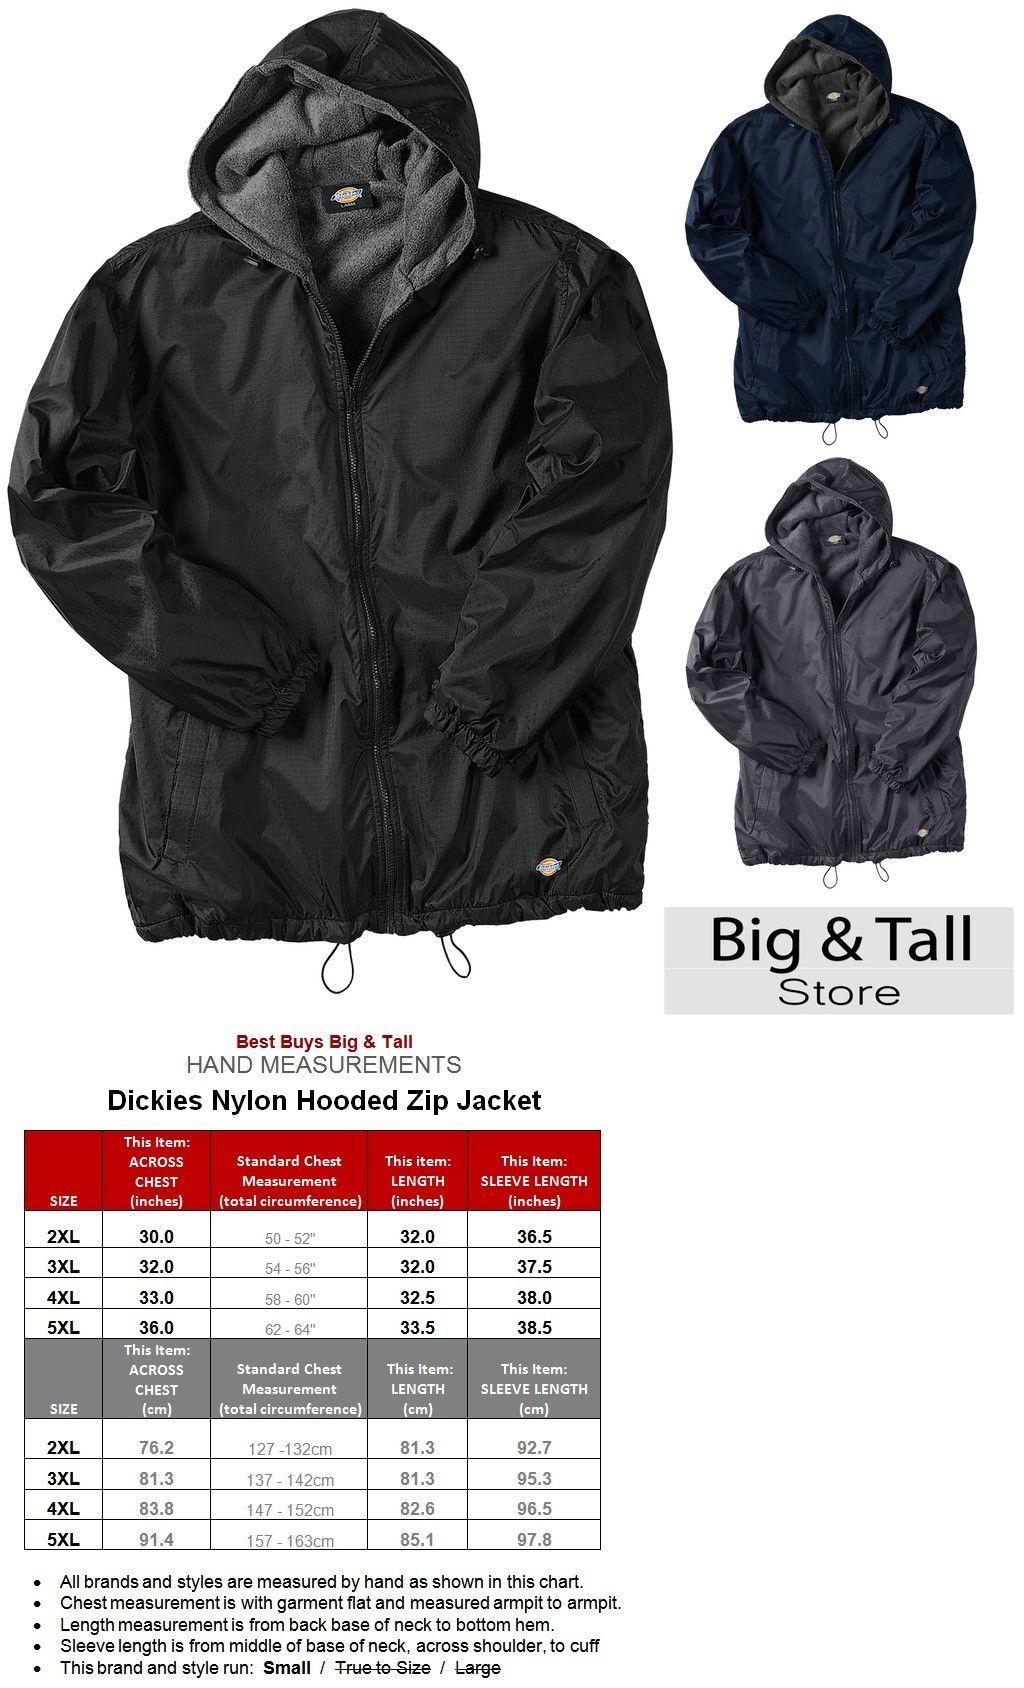 d53935a24 Mens Clothing 1059: Big Men S Dickies Hooded Nylon Zip Jacket Fleece ...